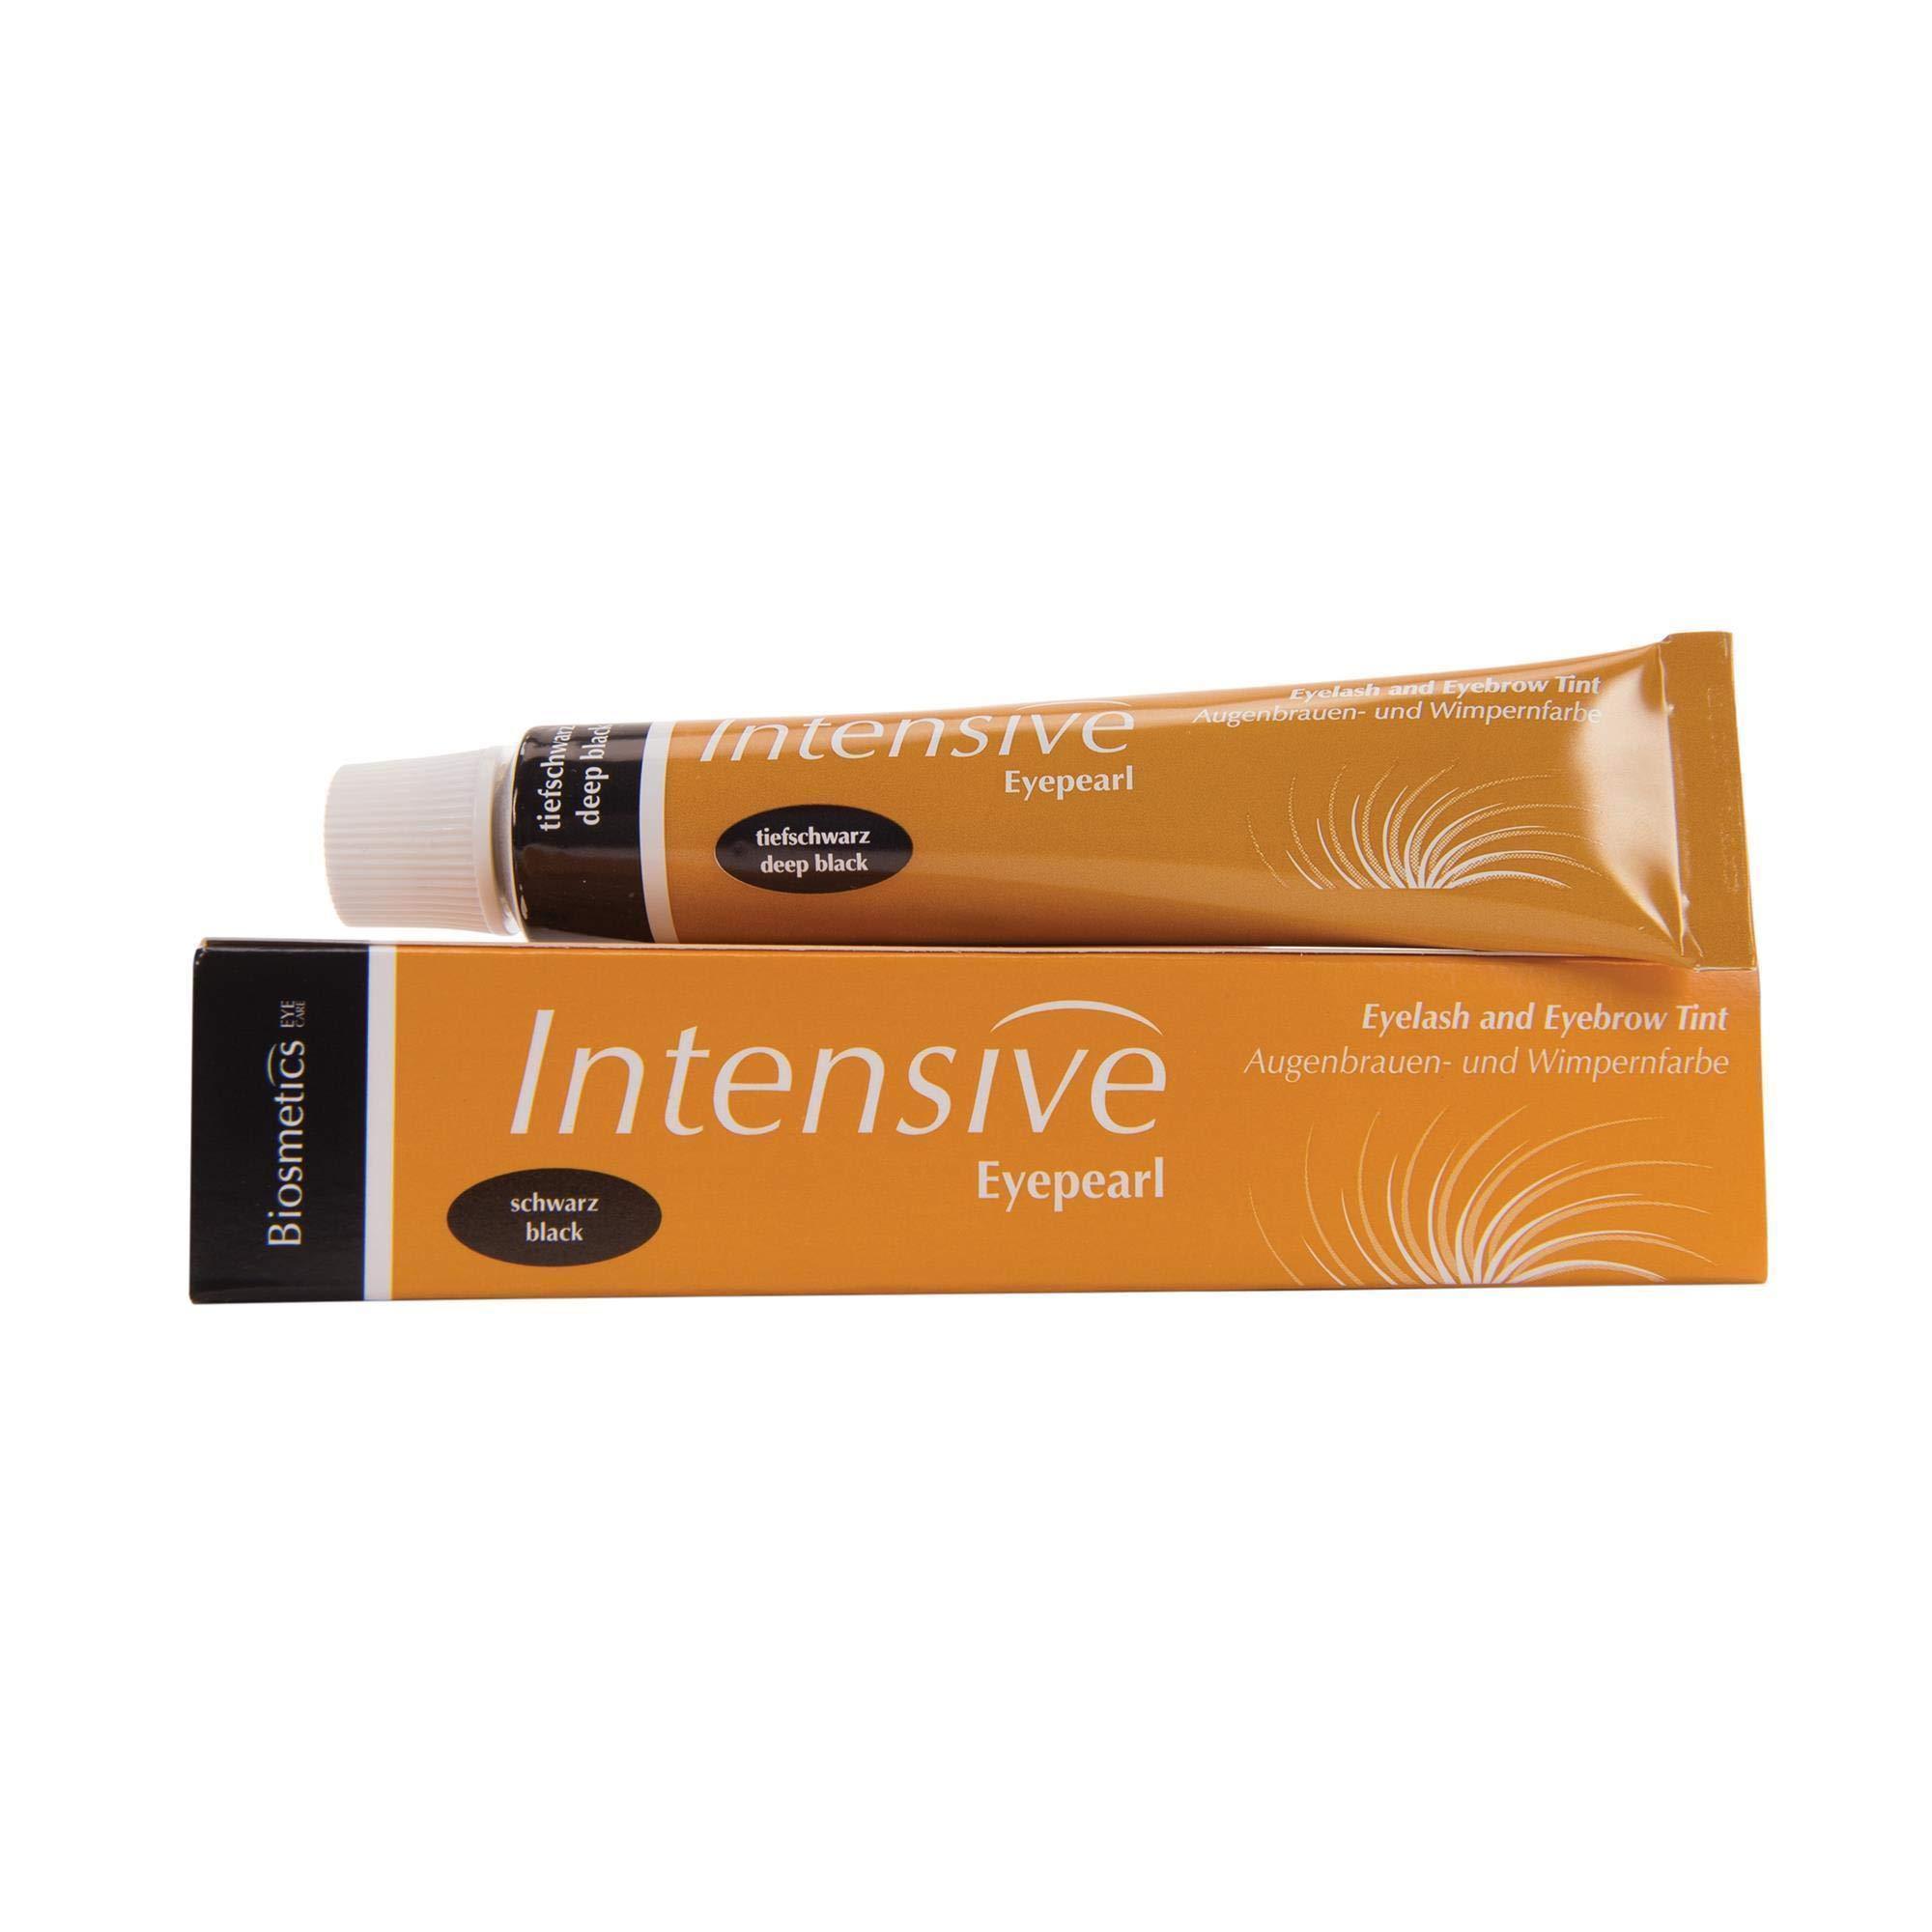 Intensive Lash & Brow Tint, Deep Black   Trusted Professional Formula   0.68 Fluid Ounces